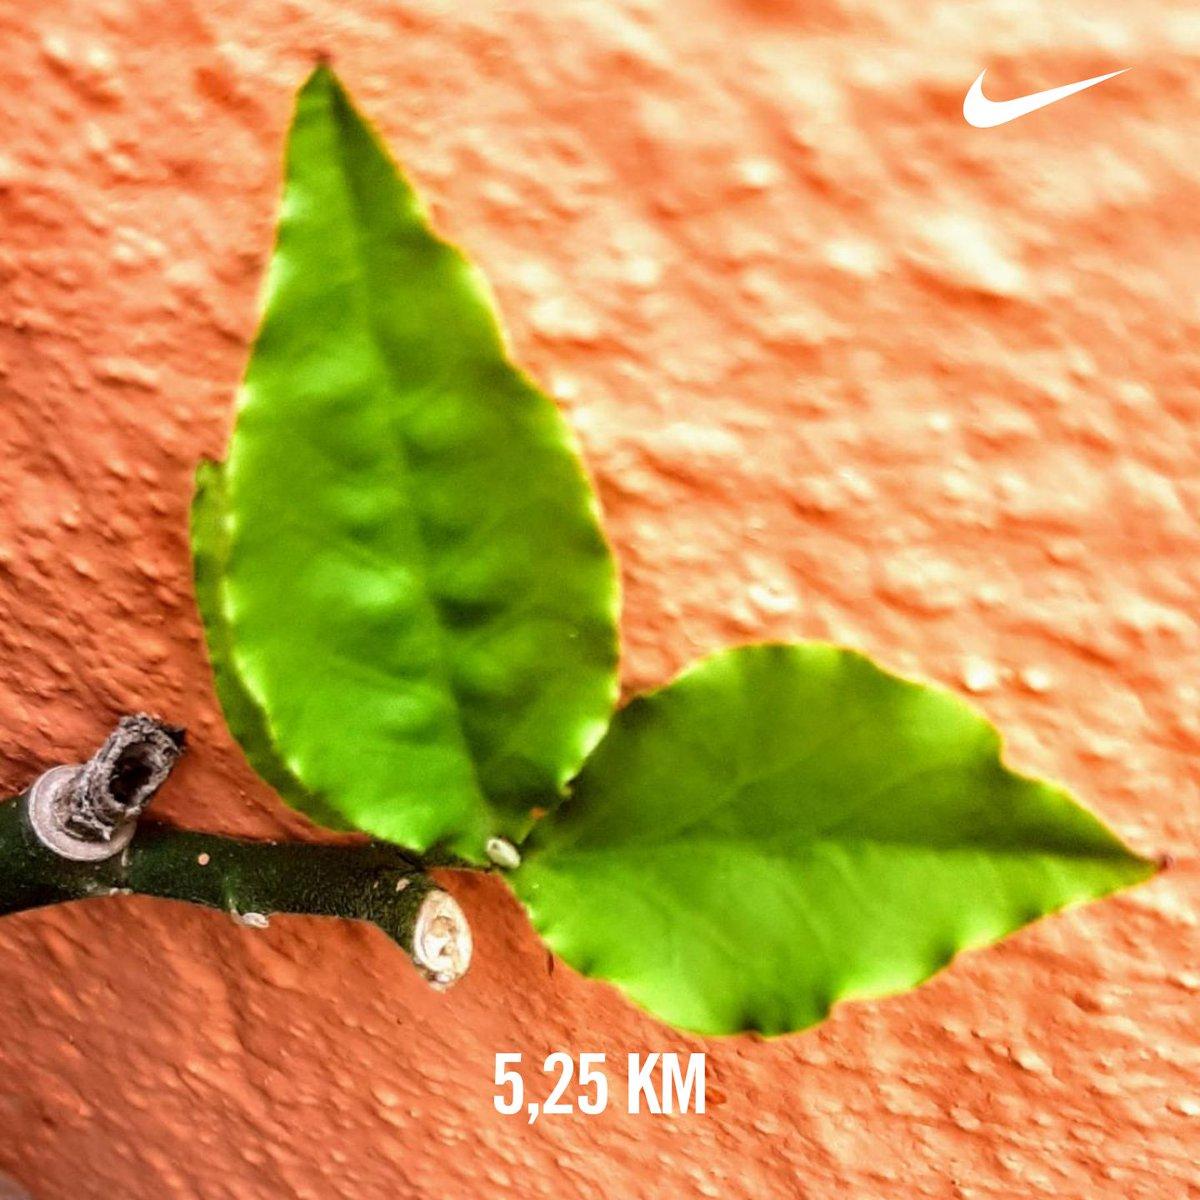 #5k no #parquedajaqueira #nrc #sextafeira ##NikeEpicReactFlyknit #nikerunclub #nikeplus #nikerunning # #pic.twitter.com/xbGgGUVUWa – at Pista de Cooper do Parque da Jaqueira